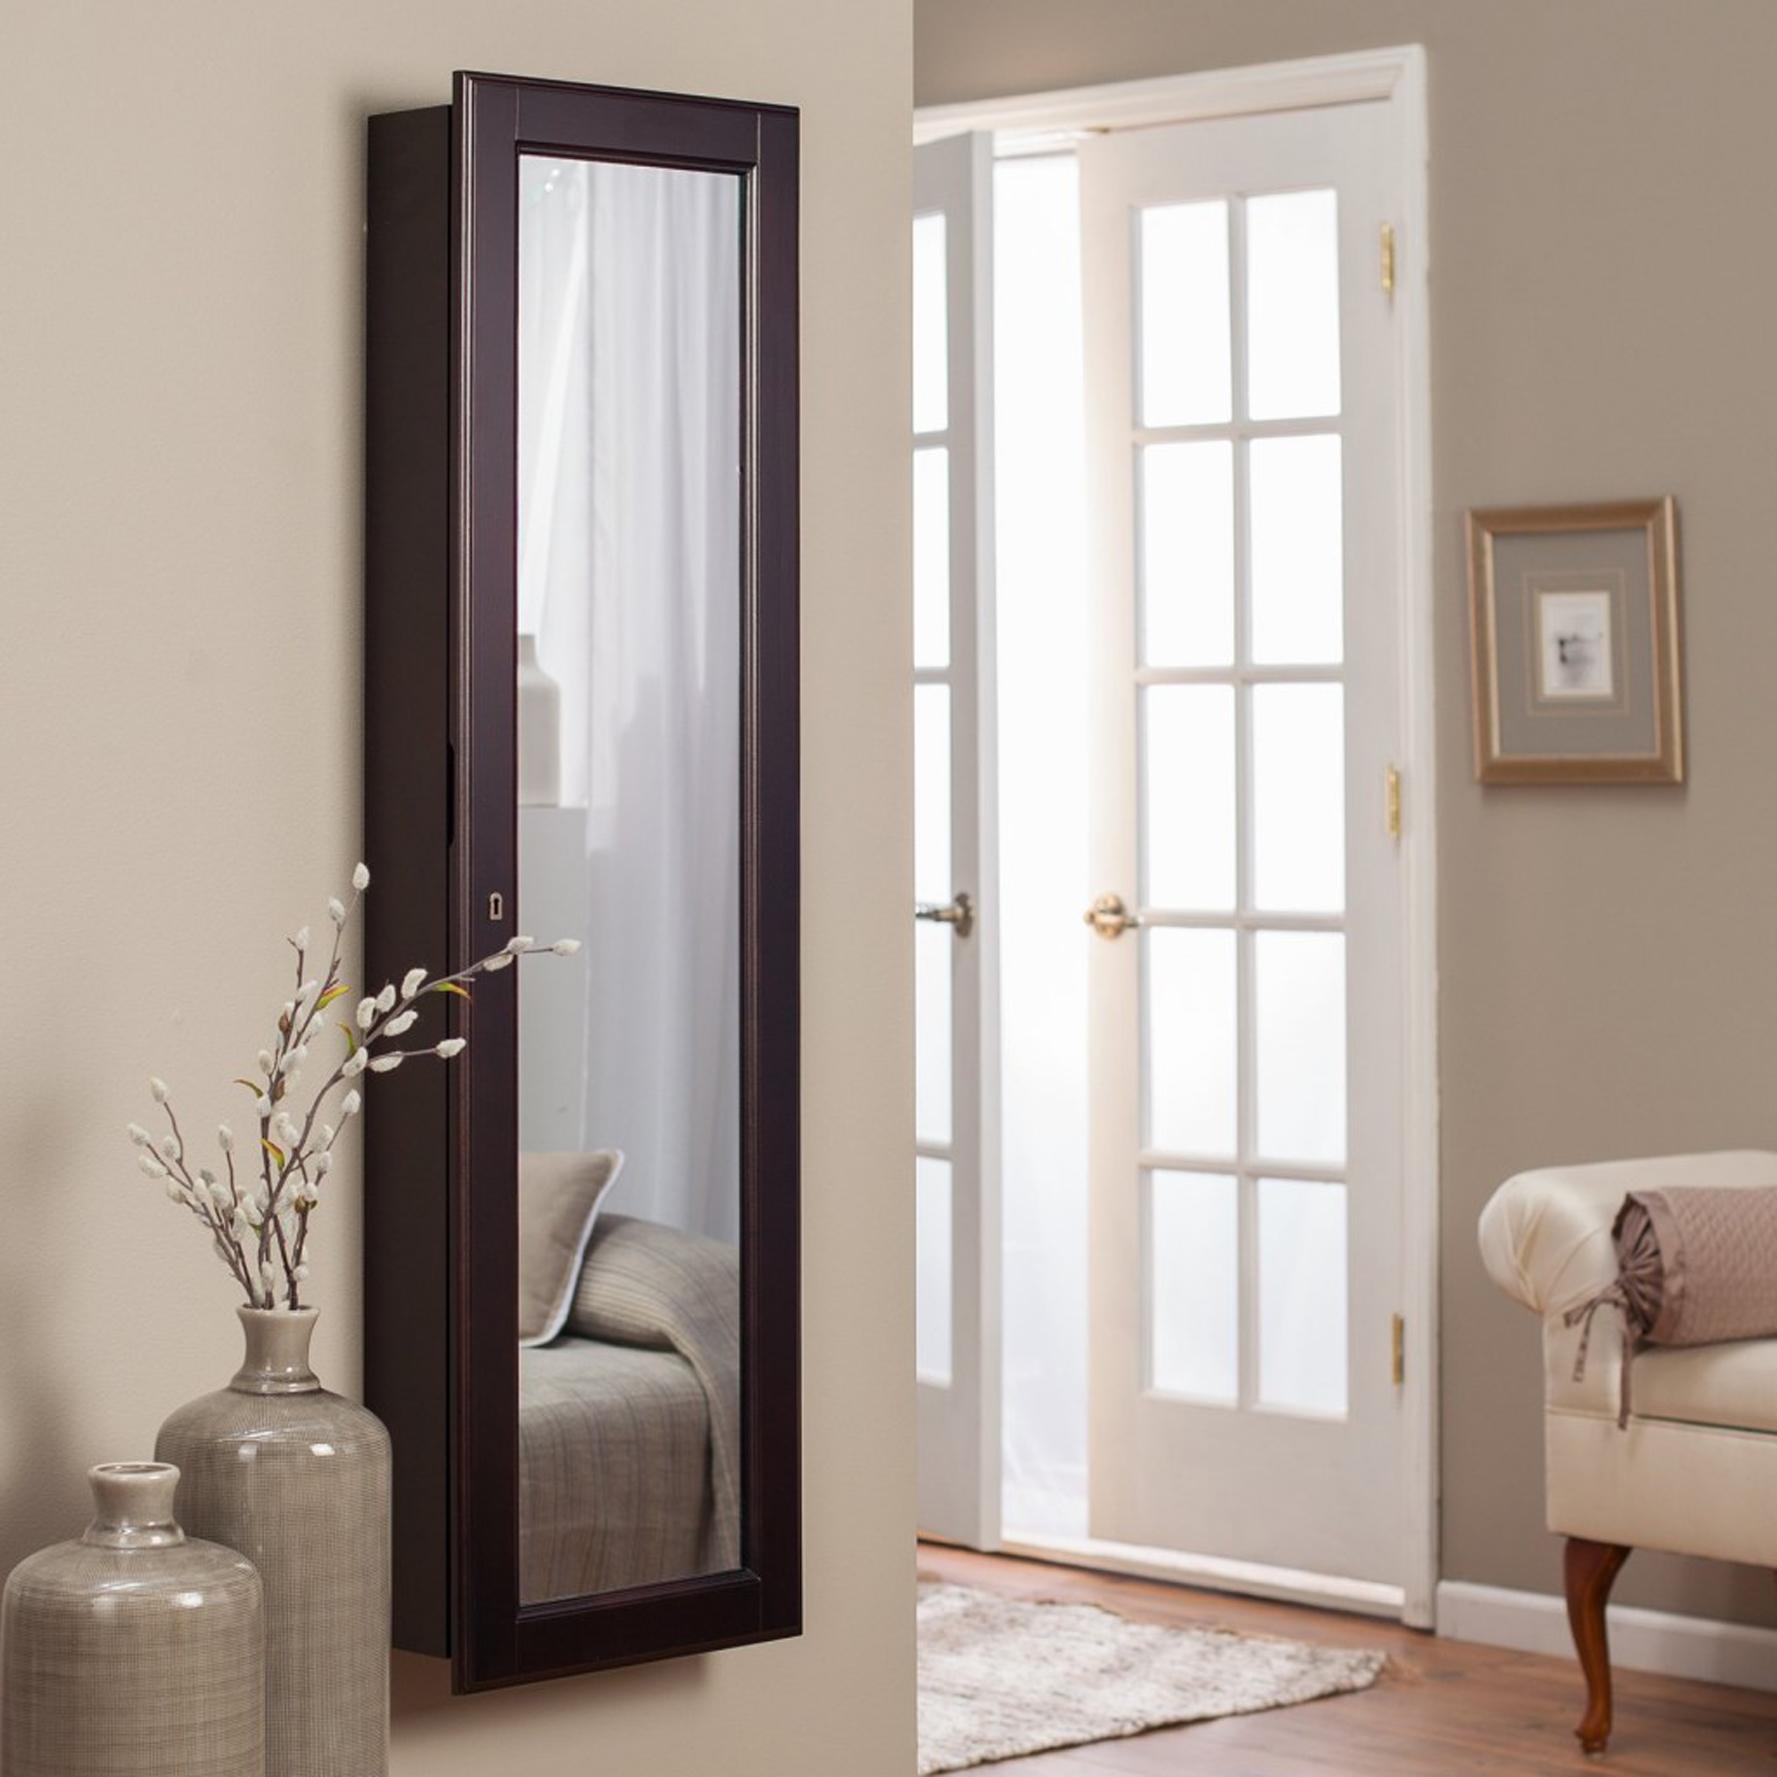 Black Bedroom Armoire